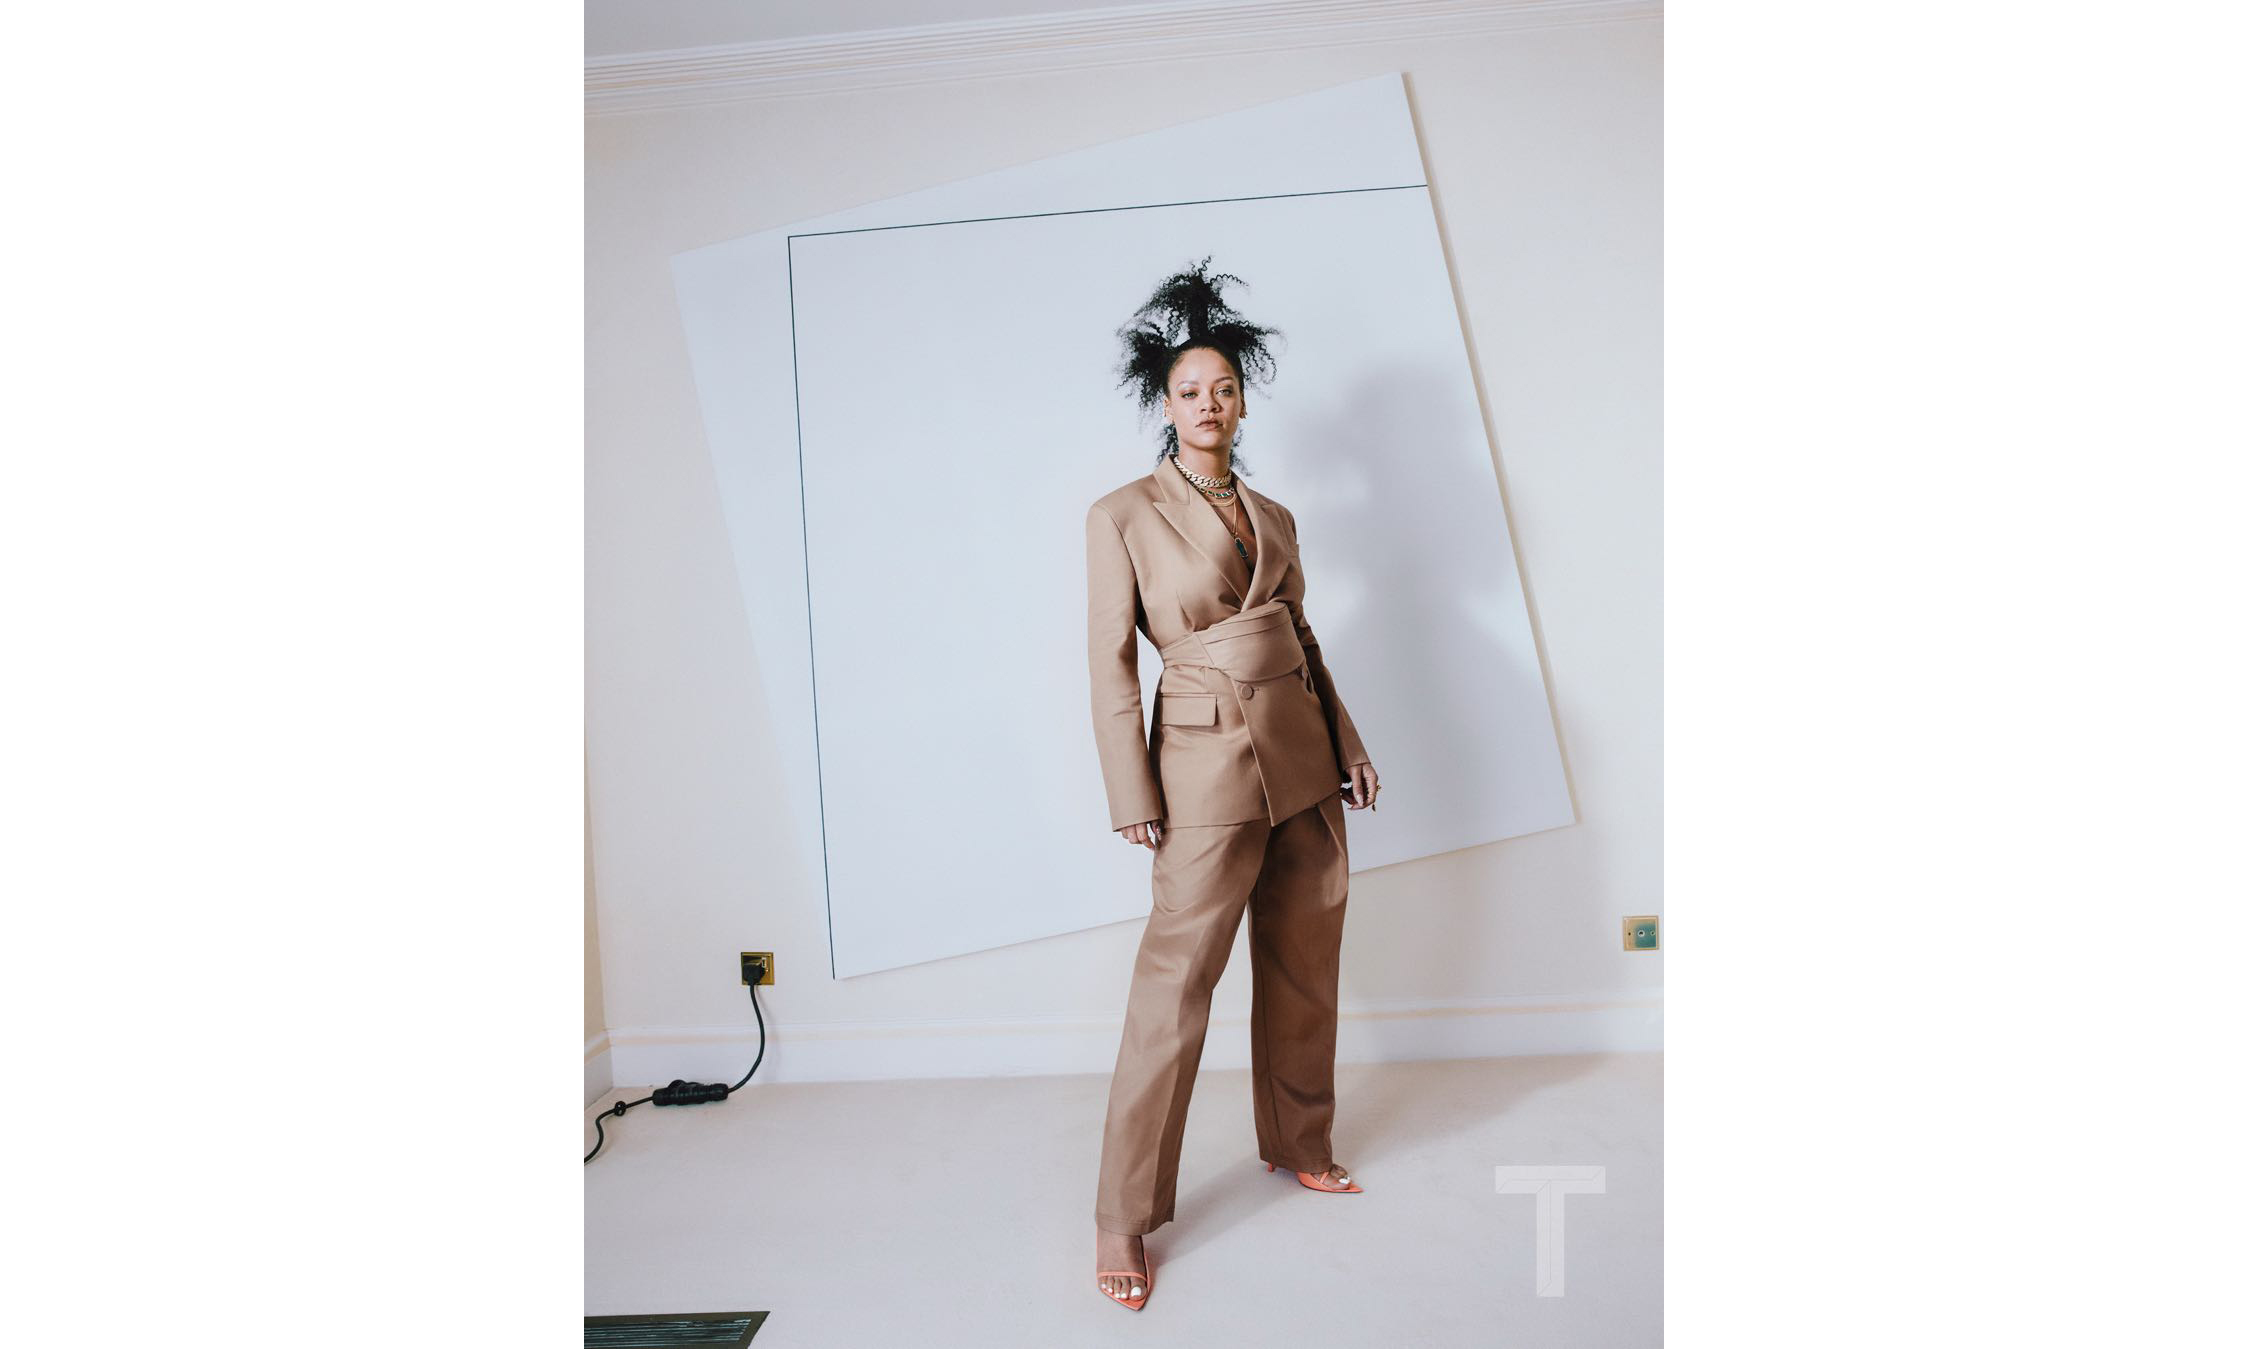 Rihanna 与 LVMH 合作品牌 FENTY 释出首个预告